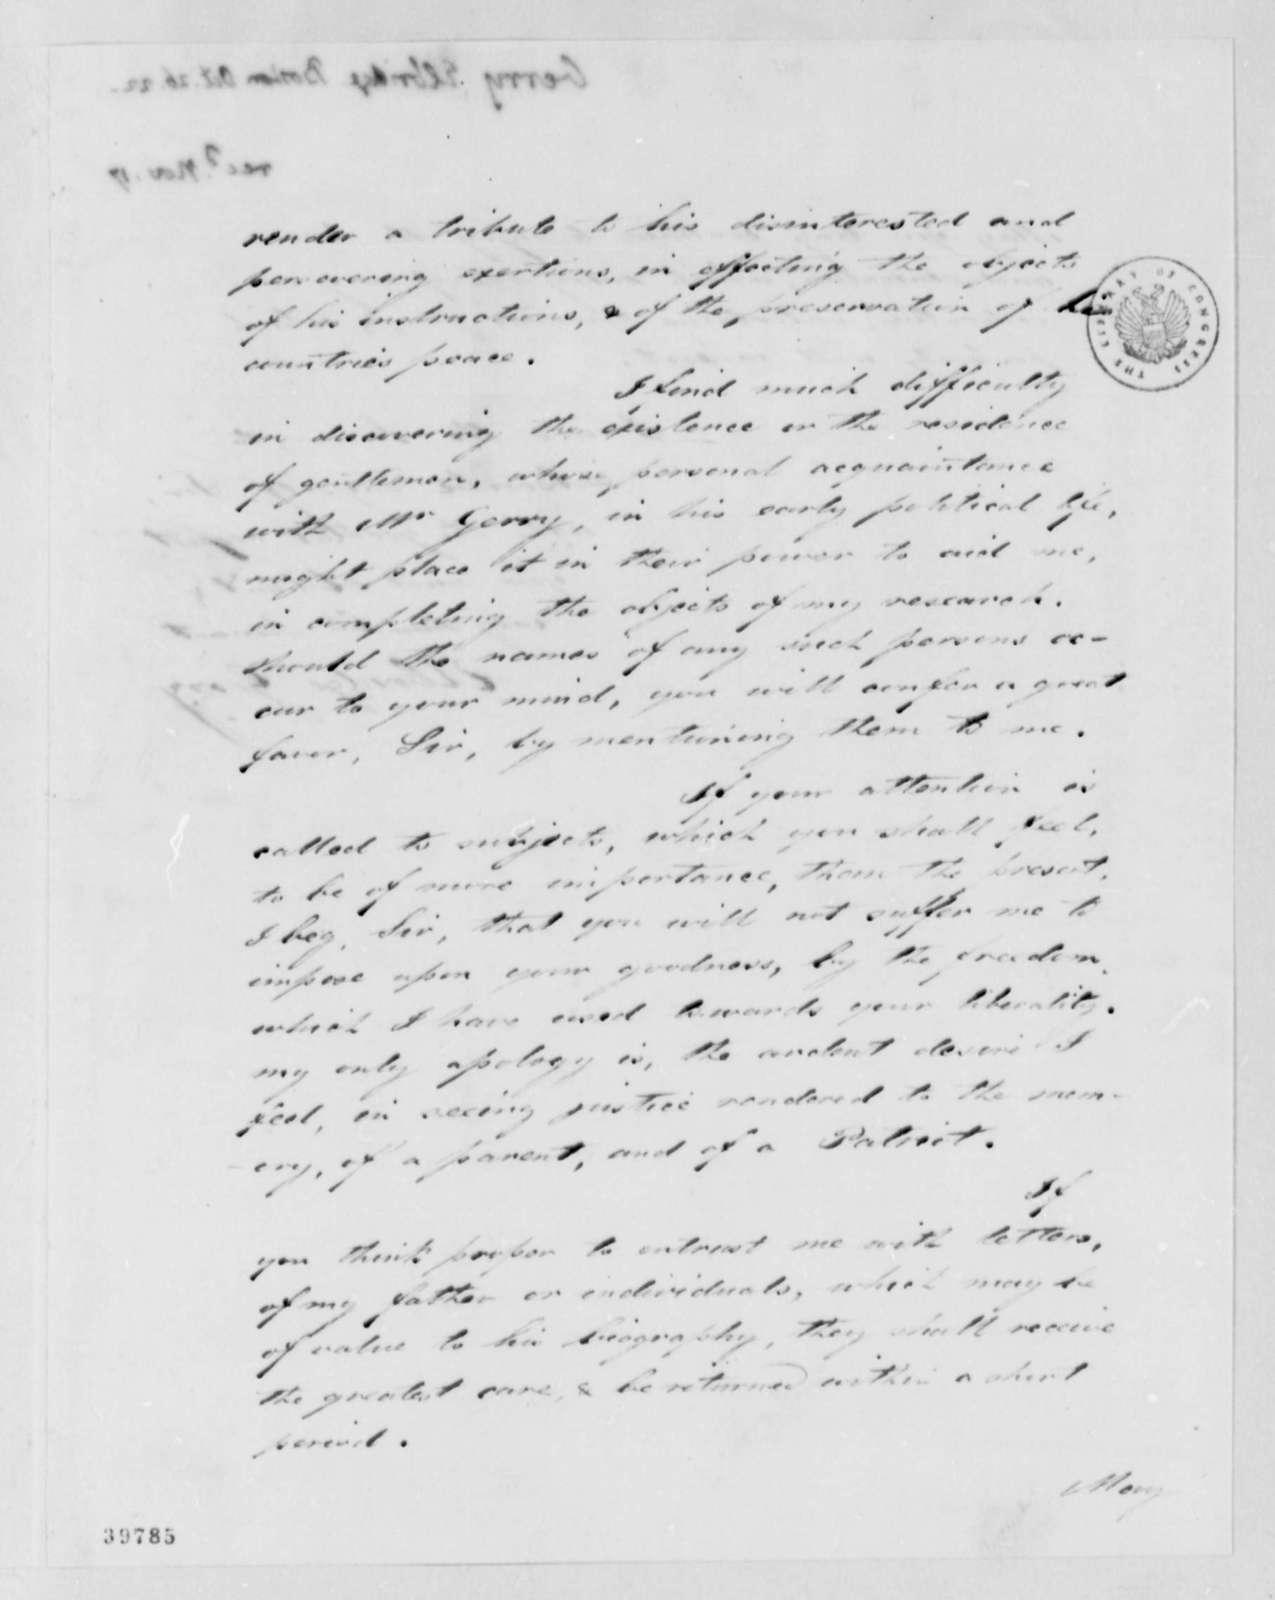 Elbridge Gerry, Jr. to Thomas Jefferson, October 26, 1822